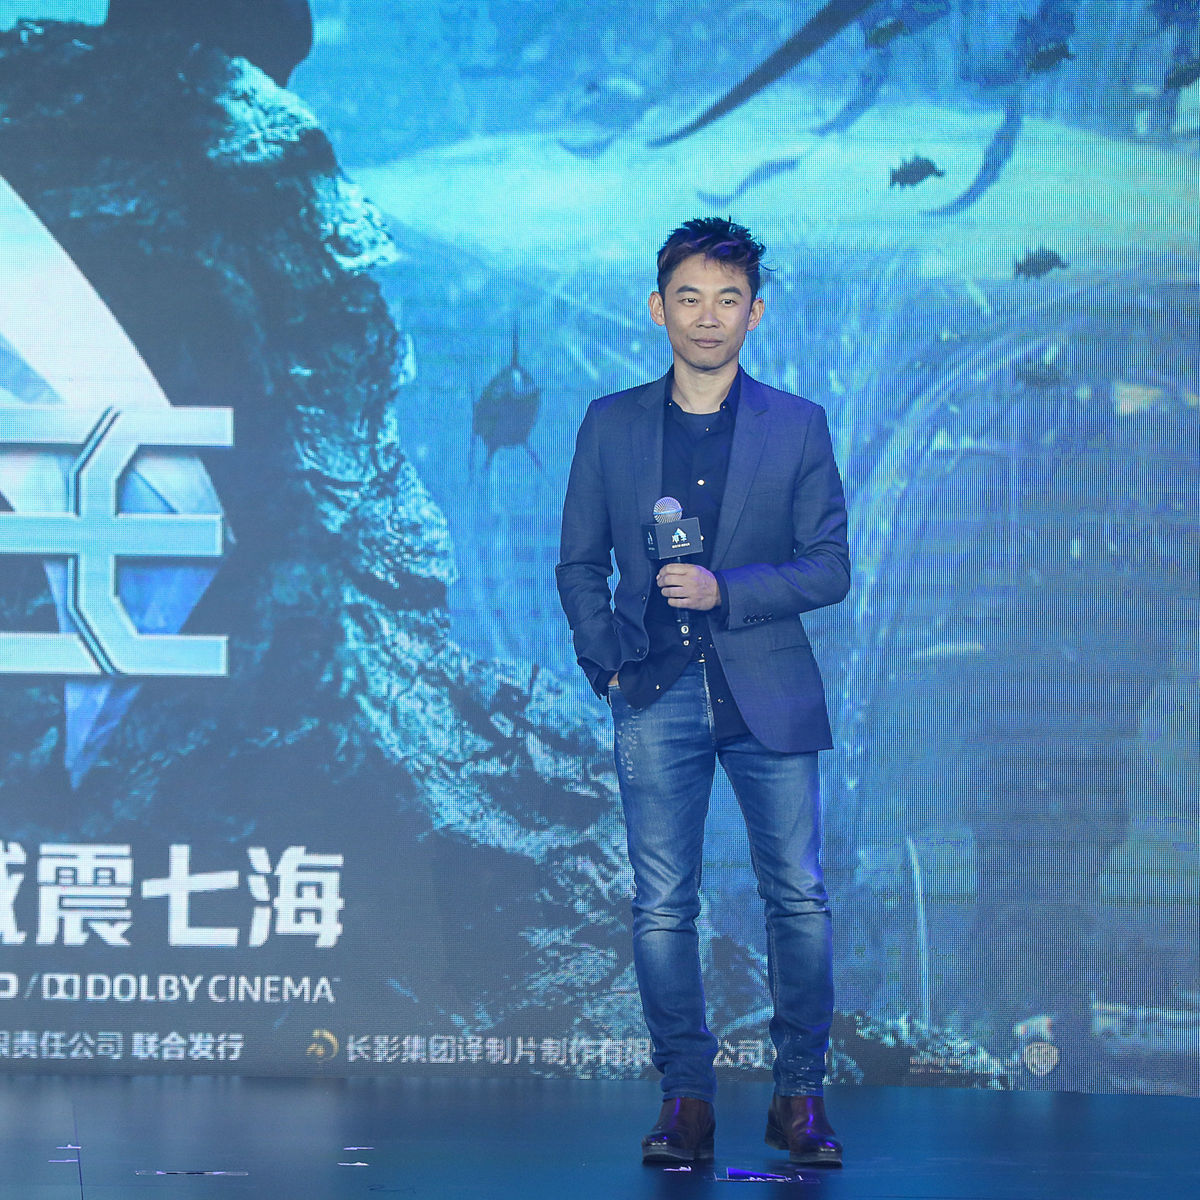 James Wan Aquaman Beijing China